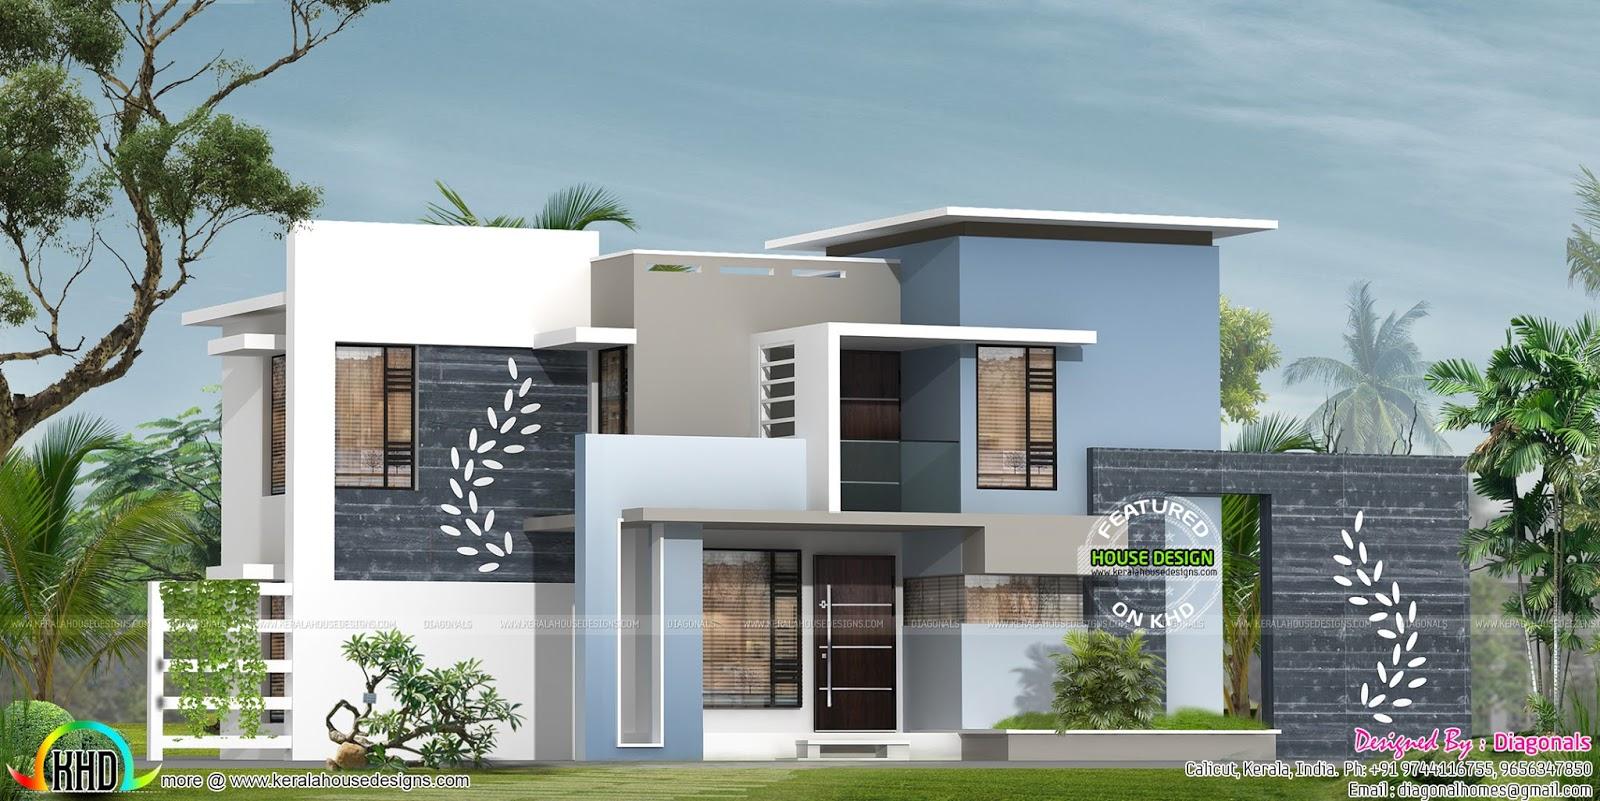 Designer Home Contemporary Flat Roof Kerala Home Design Bloglovin'